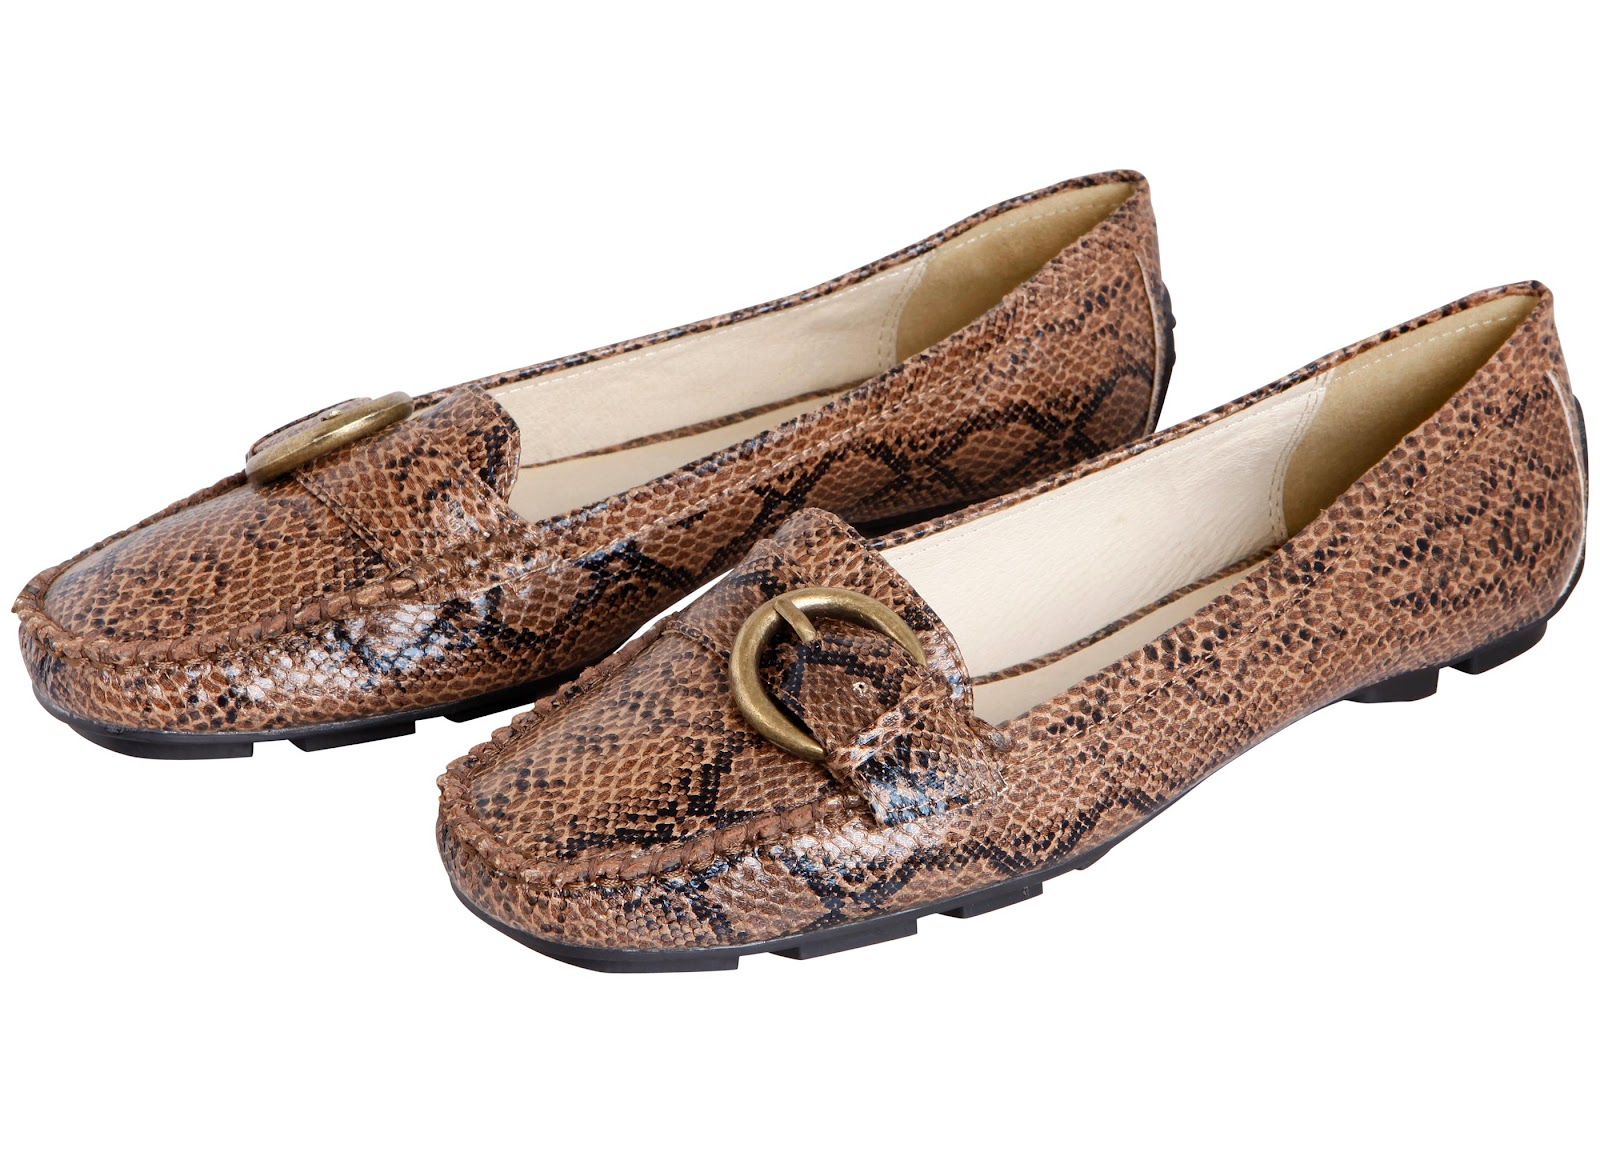 8f13ceb82 احذية جديدة نسائية ايطالية وفرنسية وغيرها من مناشيء اوروبية جلد طبيعي  ومريحة جدا للمزيد من المعلومات الاتصال على الايميل watchswiss2011@yahoo.de